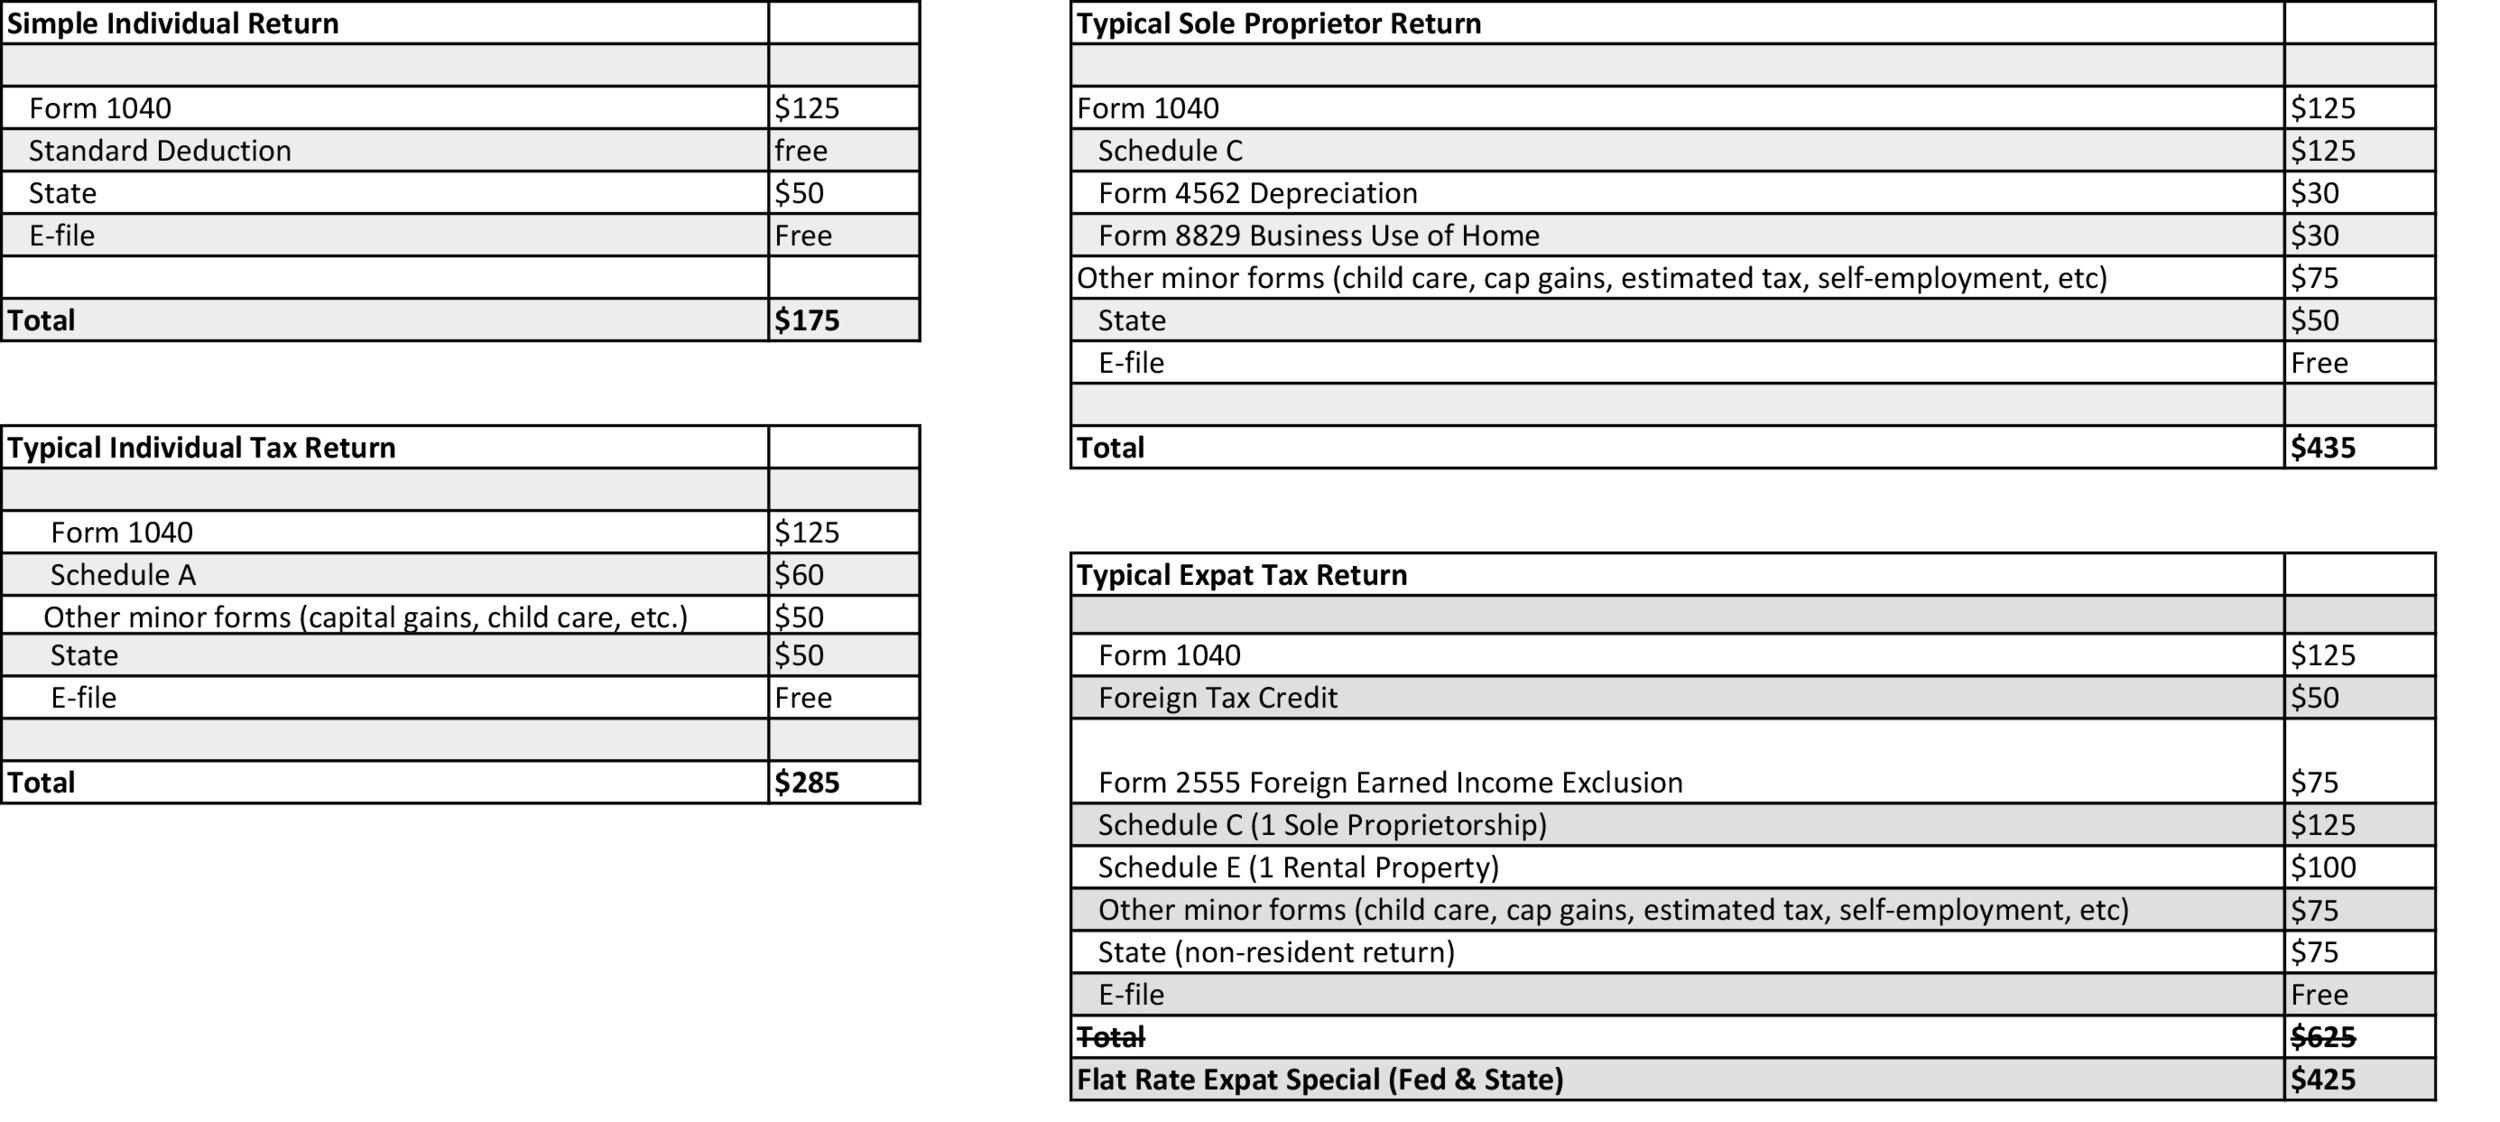 genesis-tax-preparation-fees